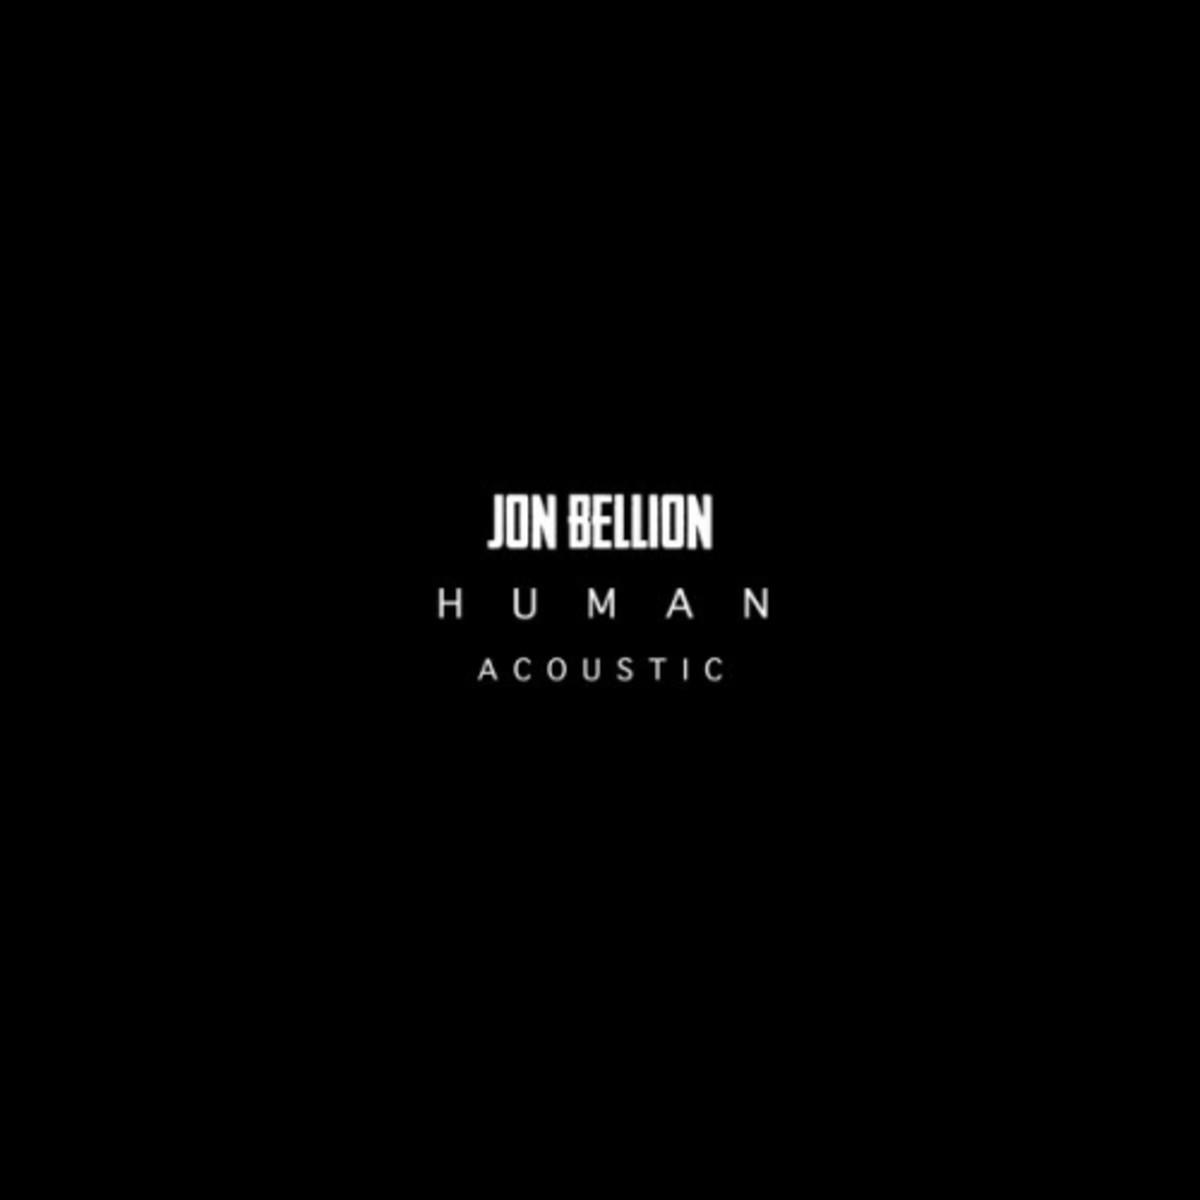 jon-bellion-human-acoustic.jpg